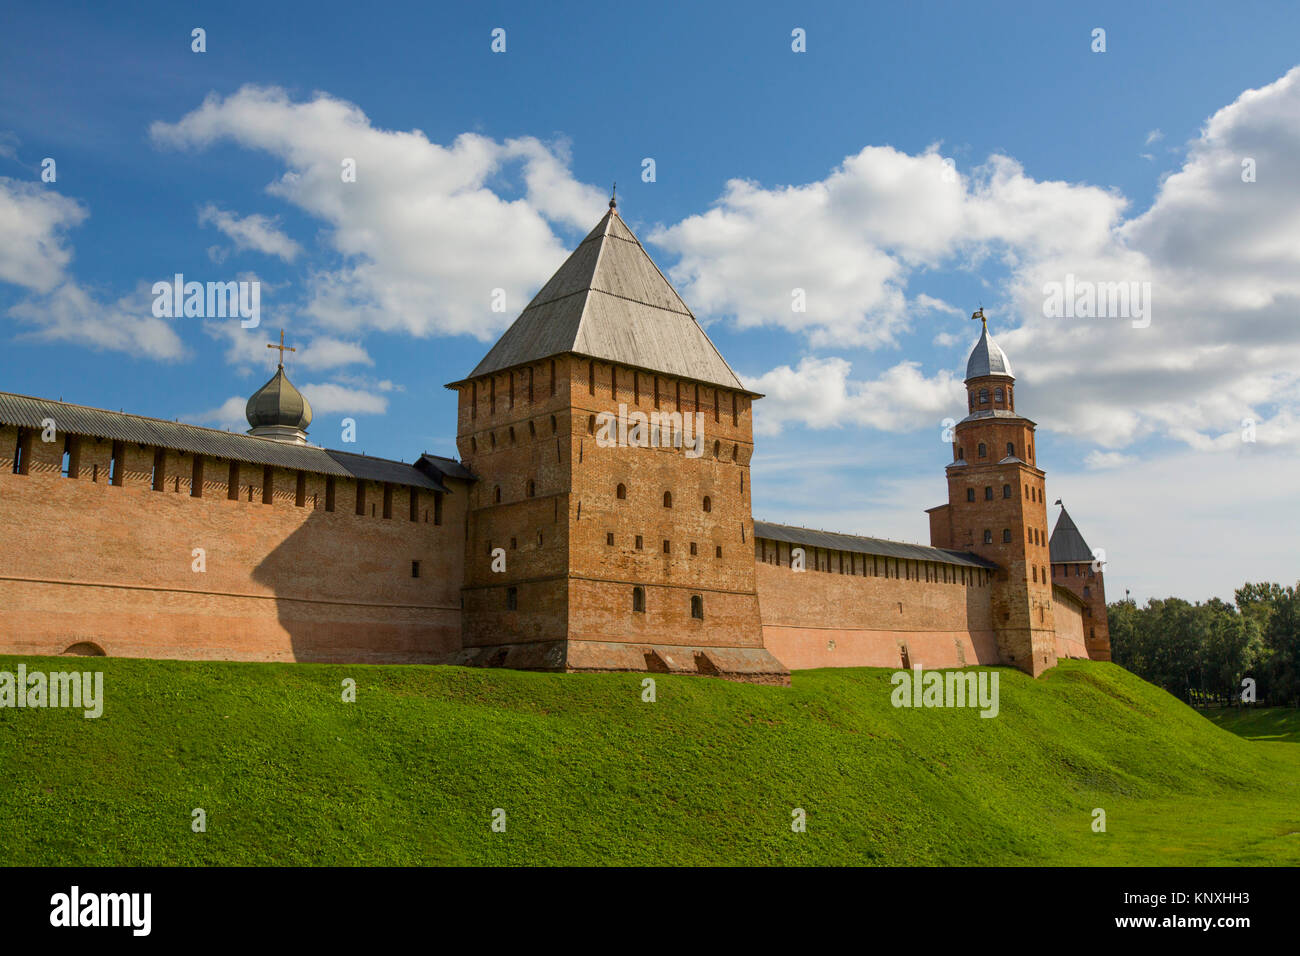 Kremlin Wall and Towers, UNESCO World Heritage Site, Veliky Novgorod, Novgorod Oblast, Russian Federation - Stock Image